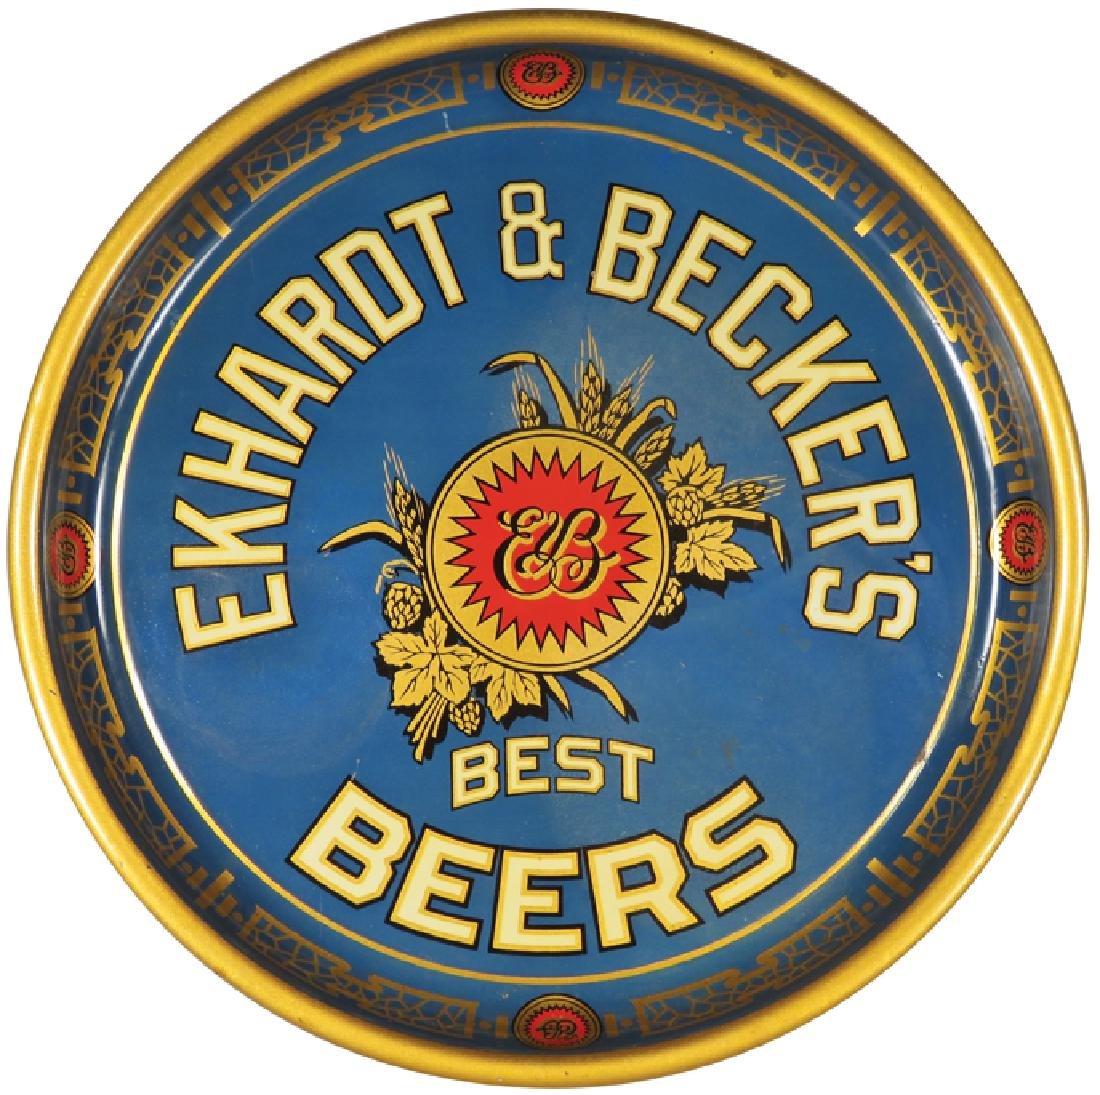 Ekhardt & Becker's Detroit Tin Serving Tray